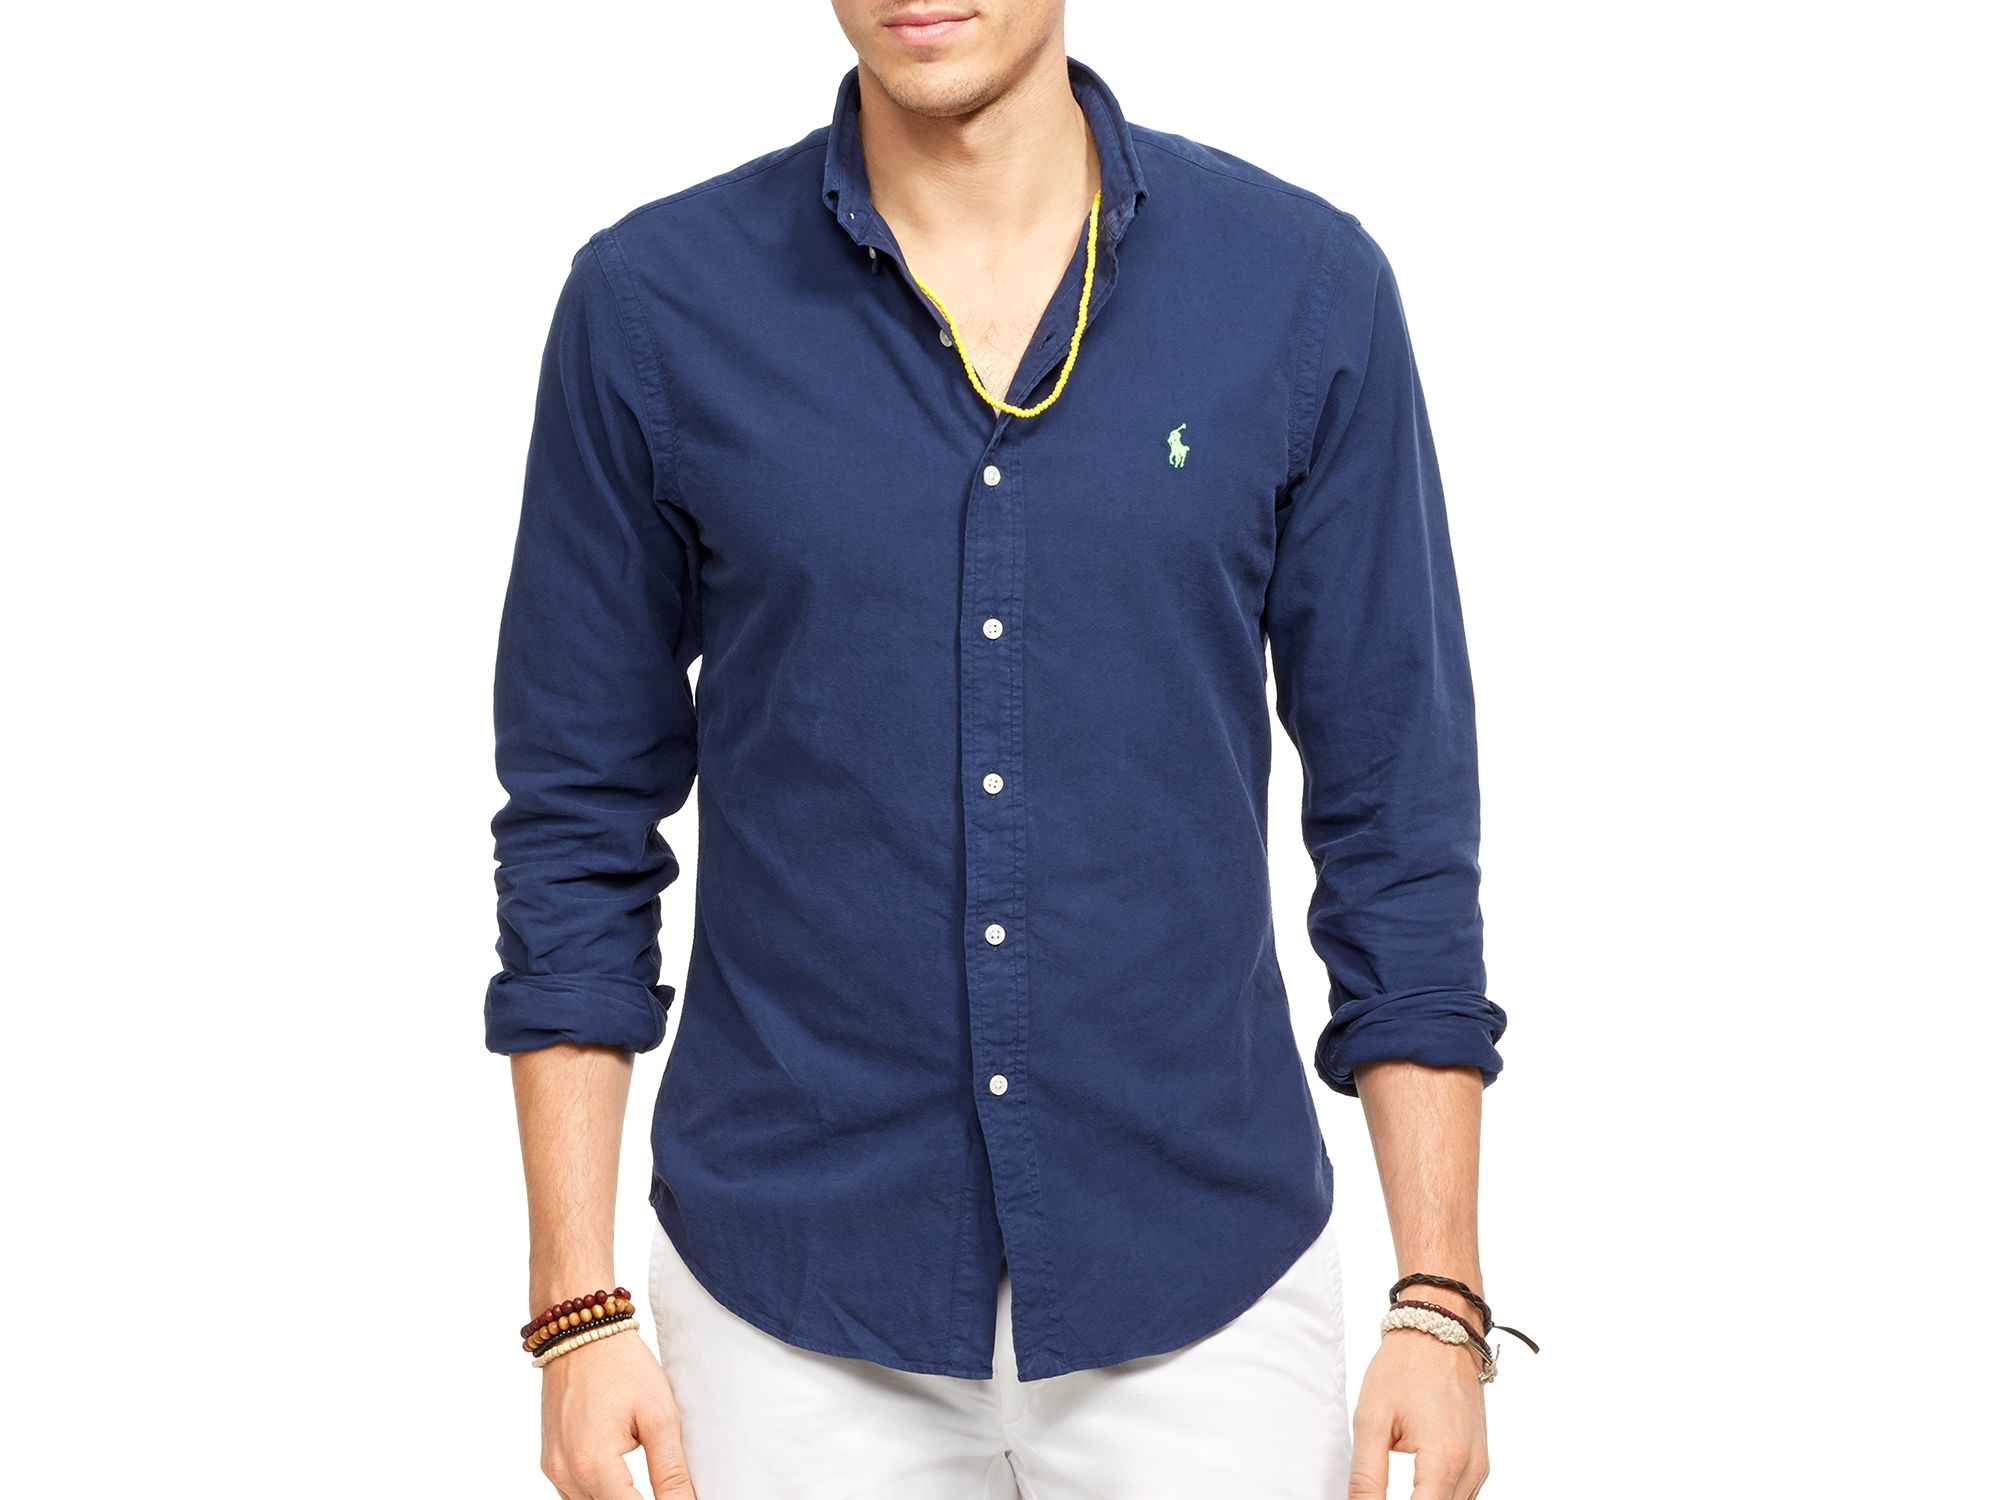 3d814103 Polo Ralph Lauren Blue Oxford Shirt - Slim Fit for men